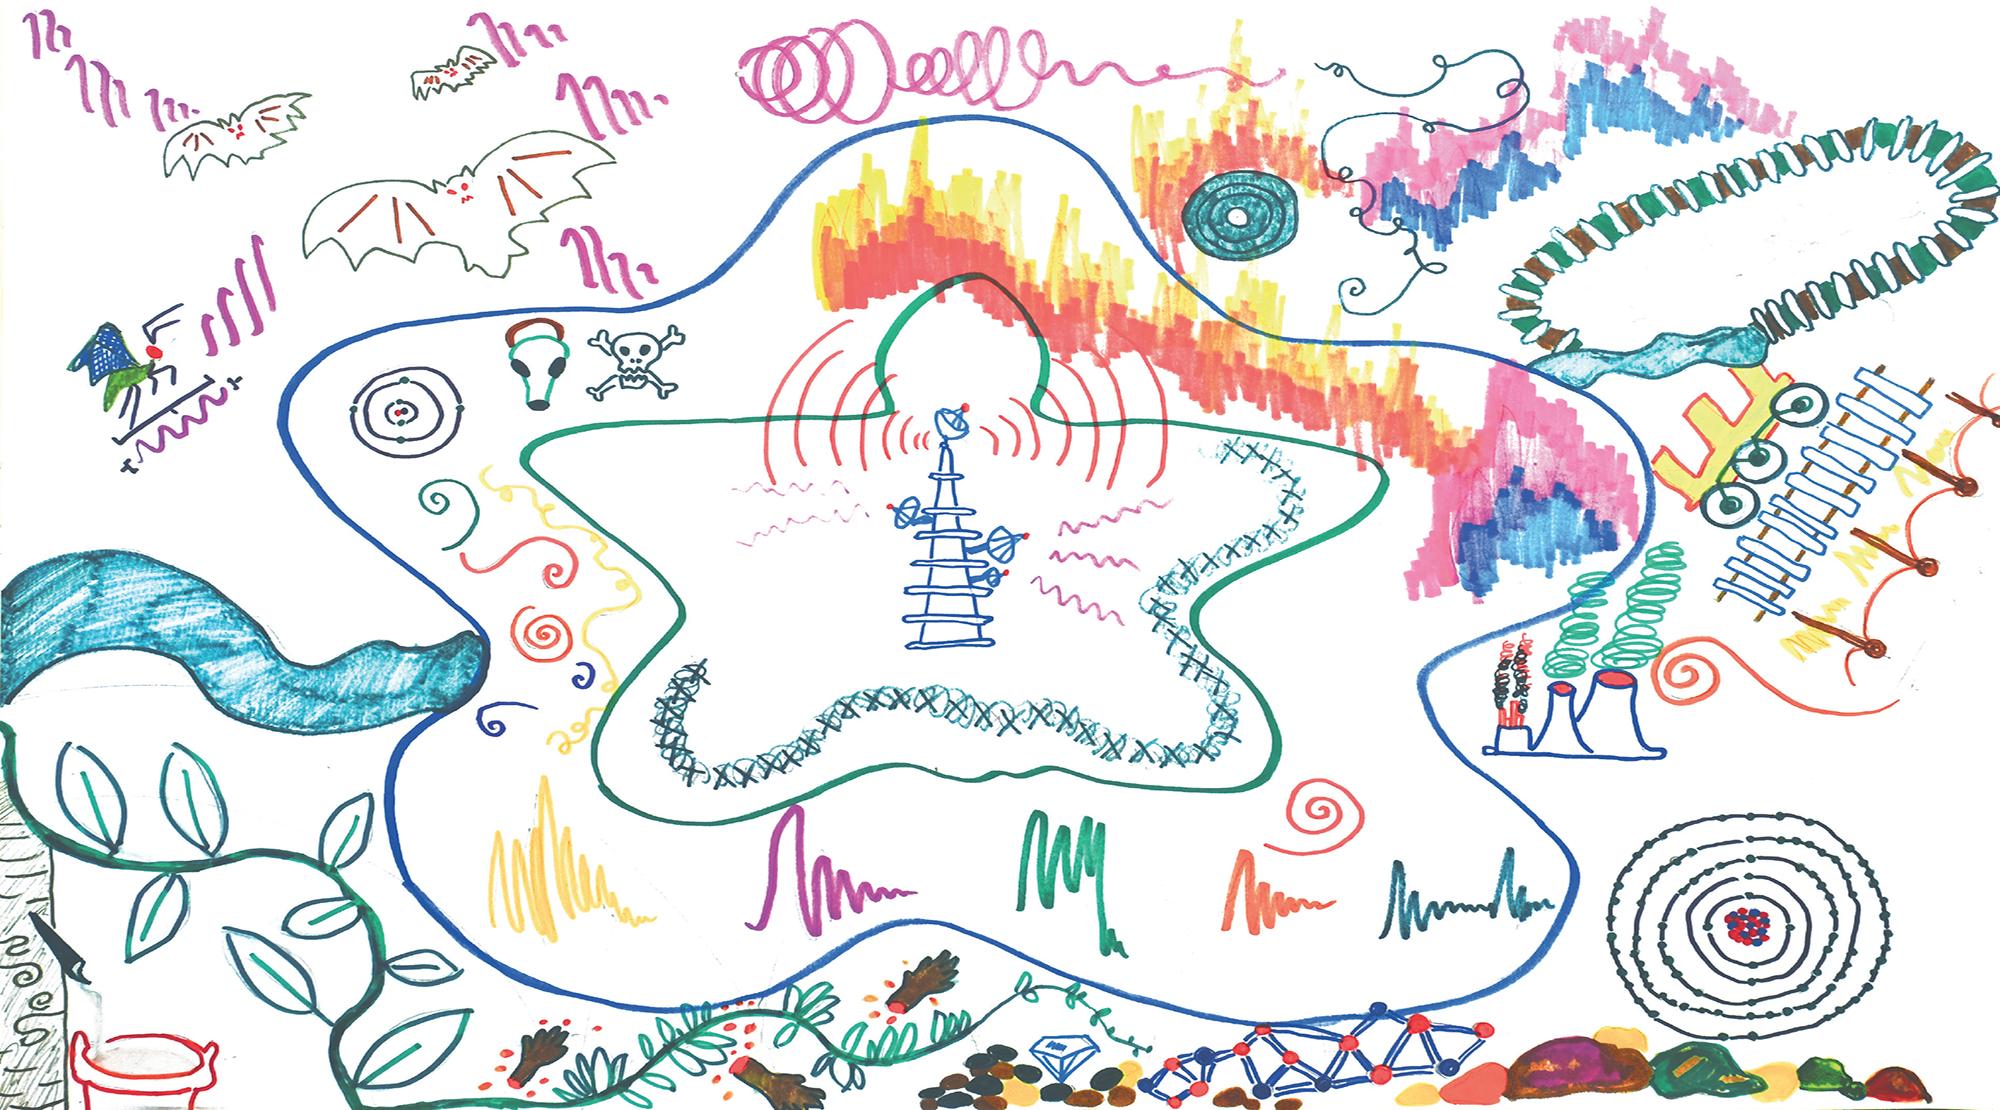 Polyphon Institute for Incongruous Translation (Natascha Sadr Haghighian & Ashkan Sepahvand), Carbon Theater Act III Dark Loops, 2020 © Natascha Sadr Haghighian and Ashkan Sepahvand Perspektive